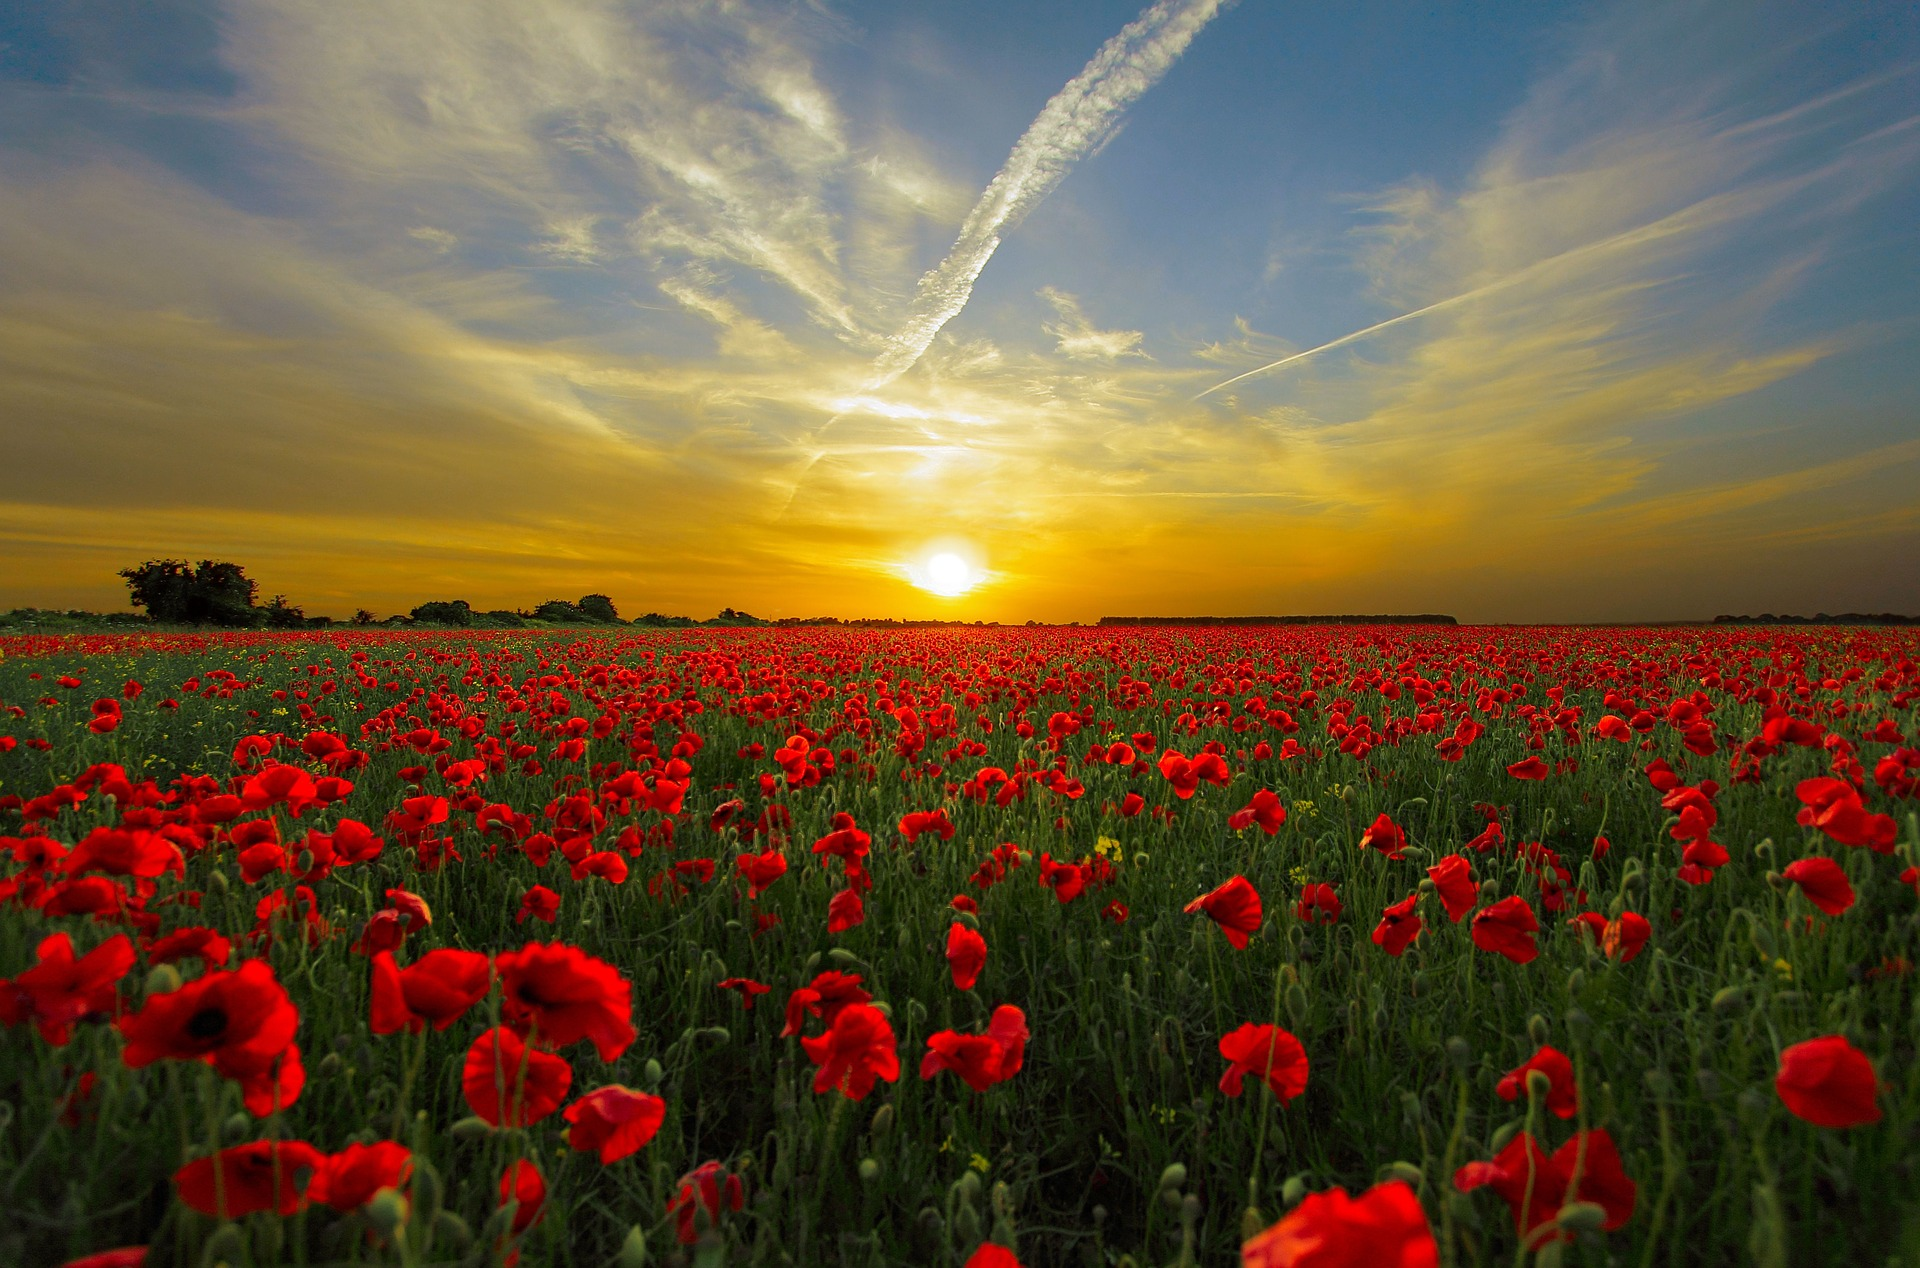 Image: Poppies via Pixabay